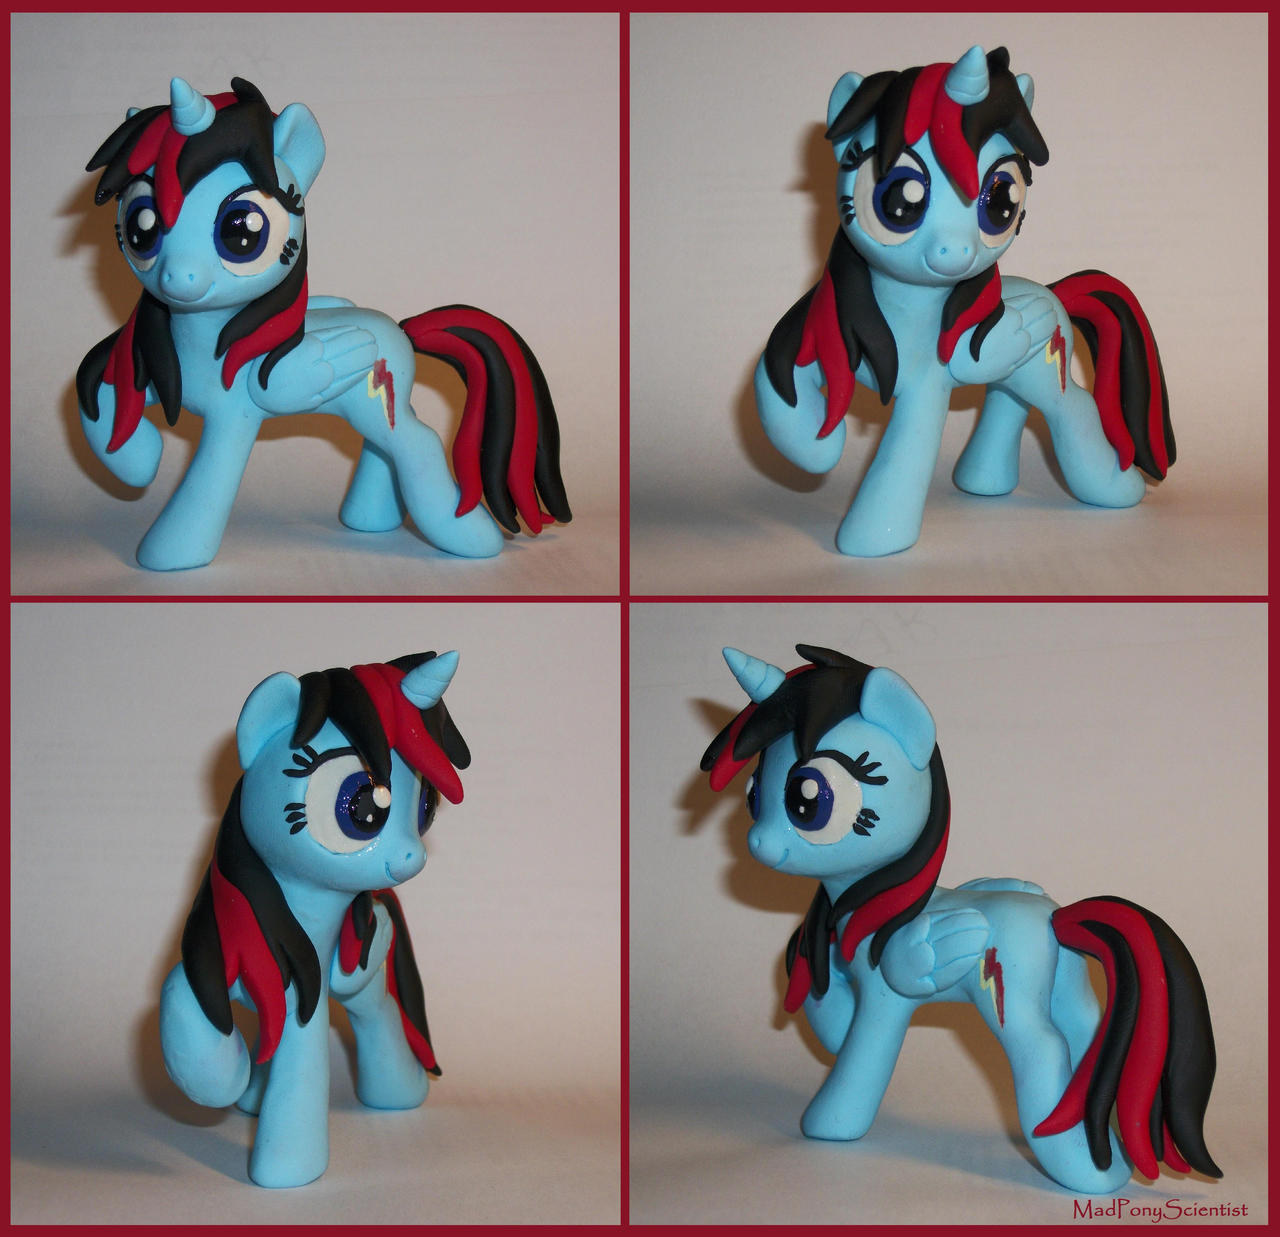 Ponysculptors 1st Pony giveaway prize 2 by MadPonyScientist